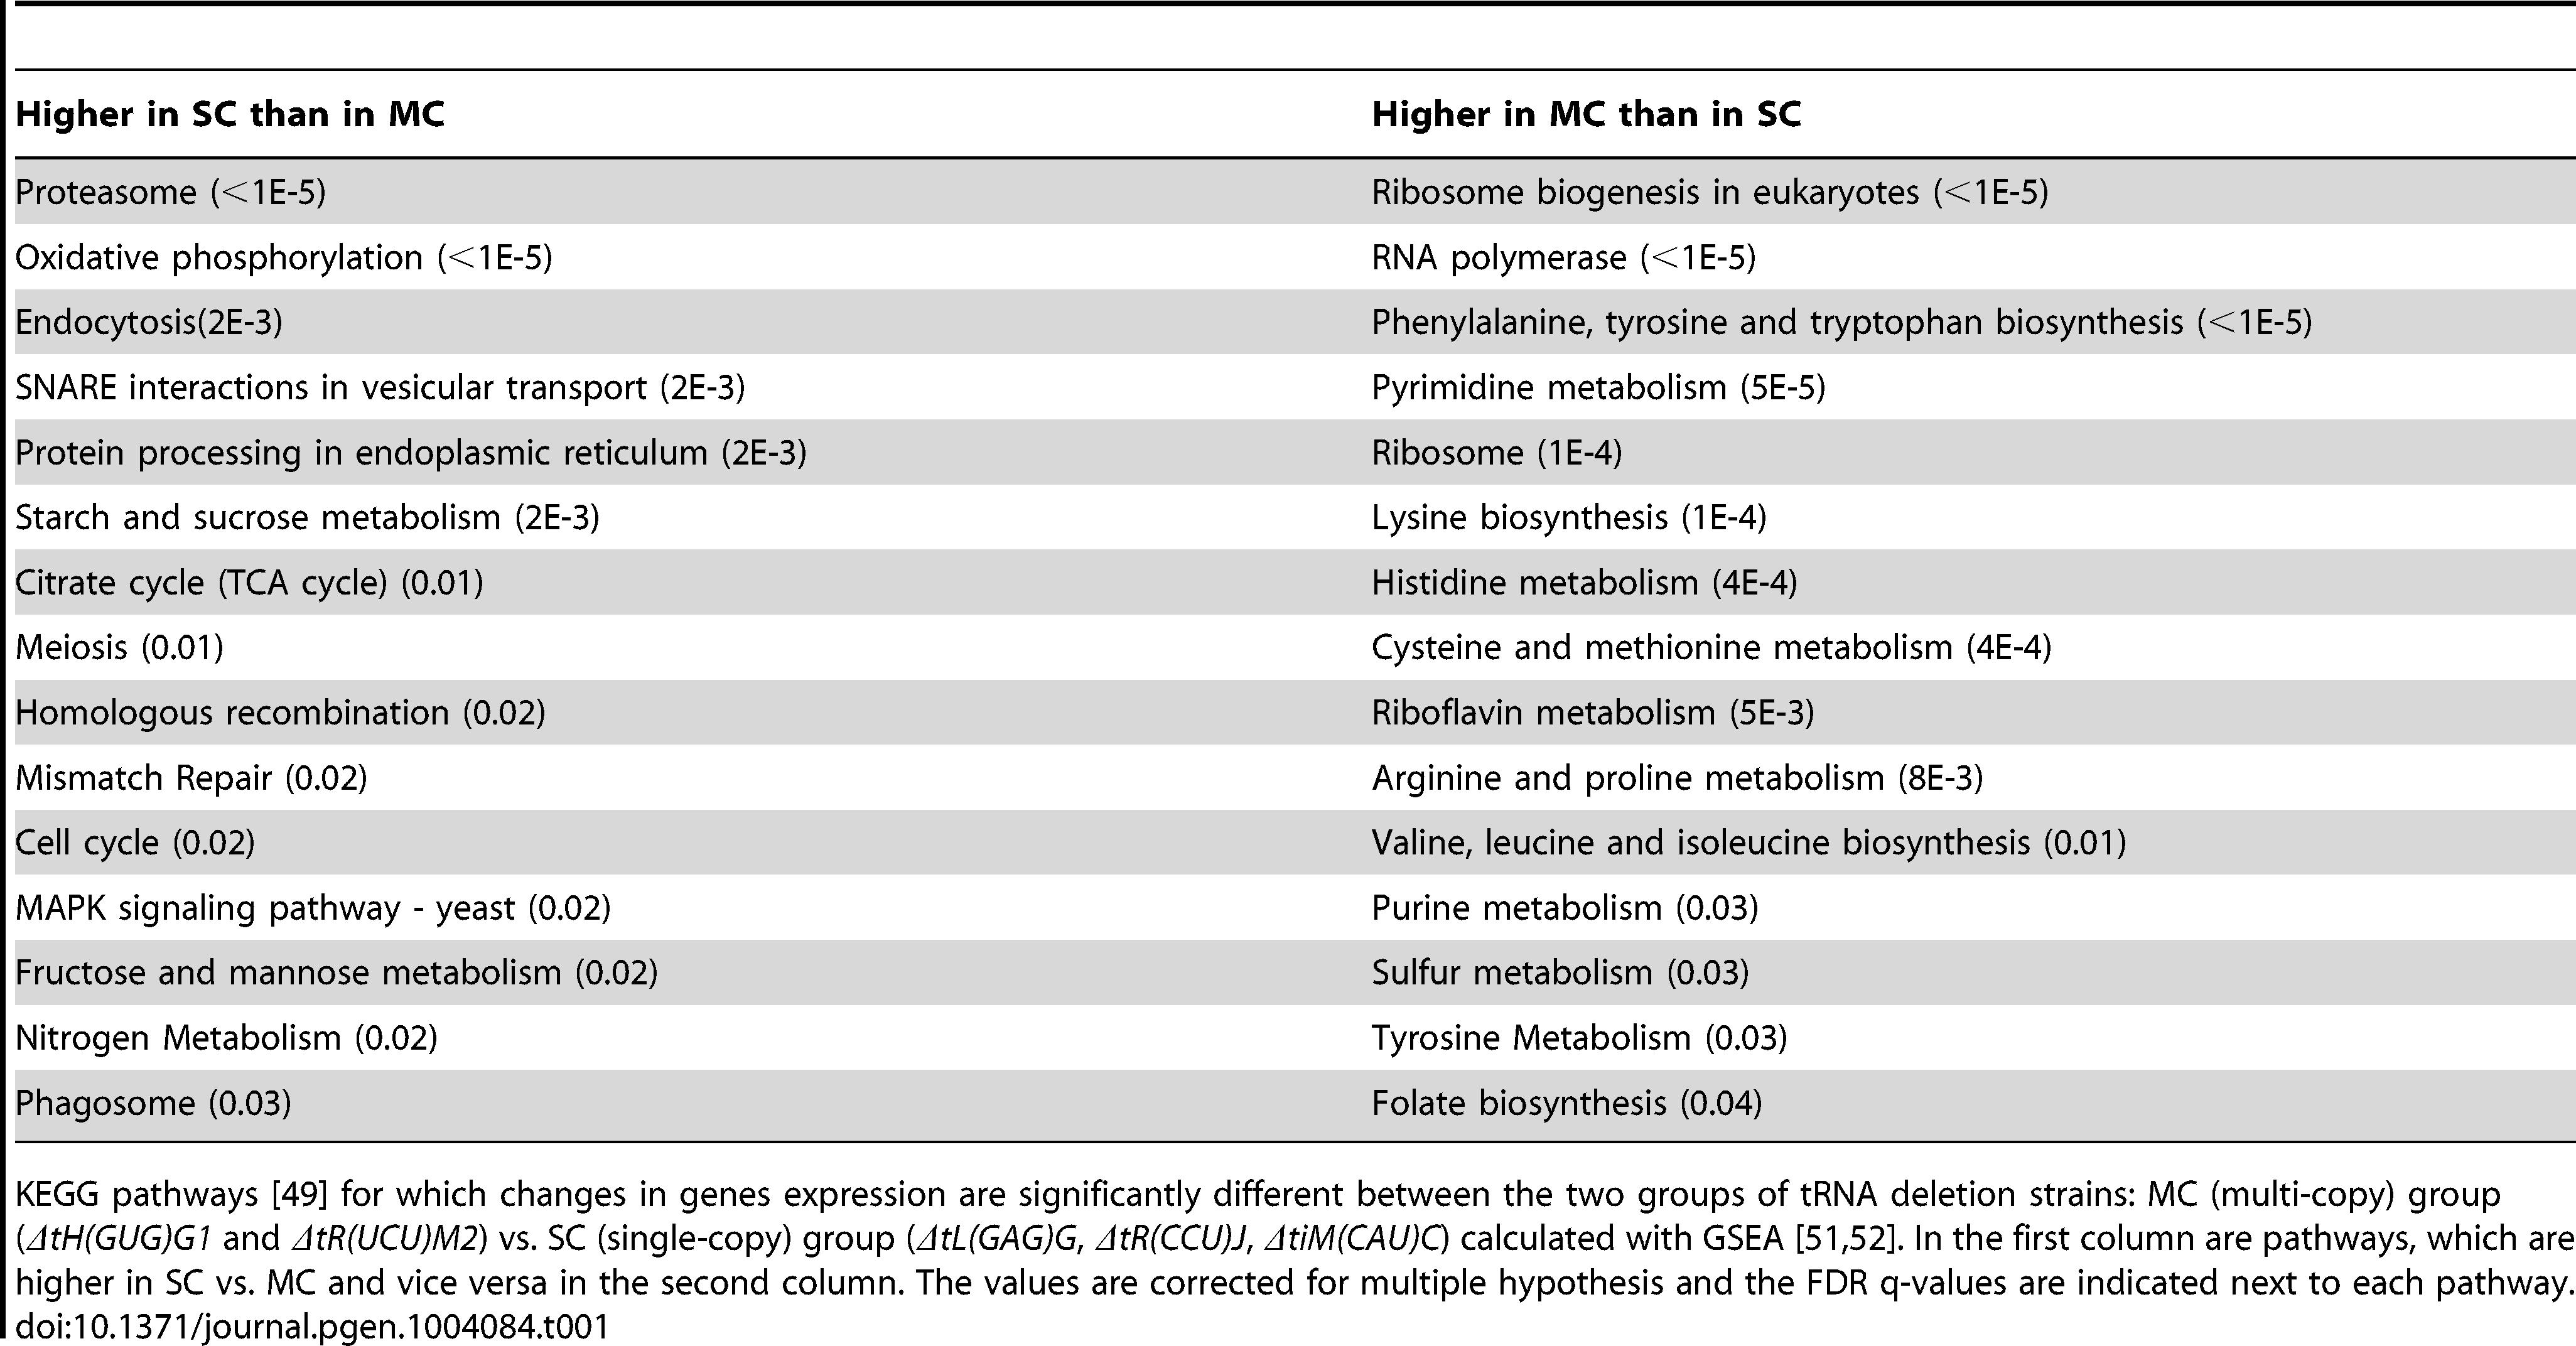 KEGG pathways differentiating between tRNA deletion sets.